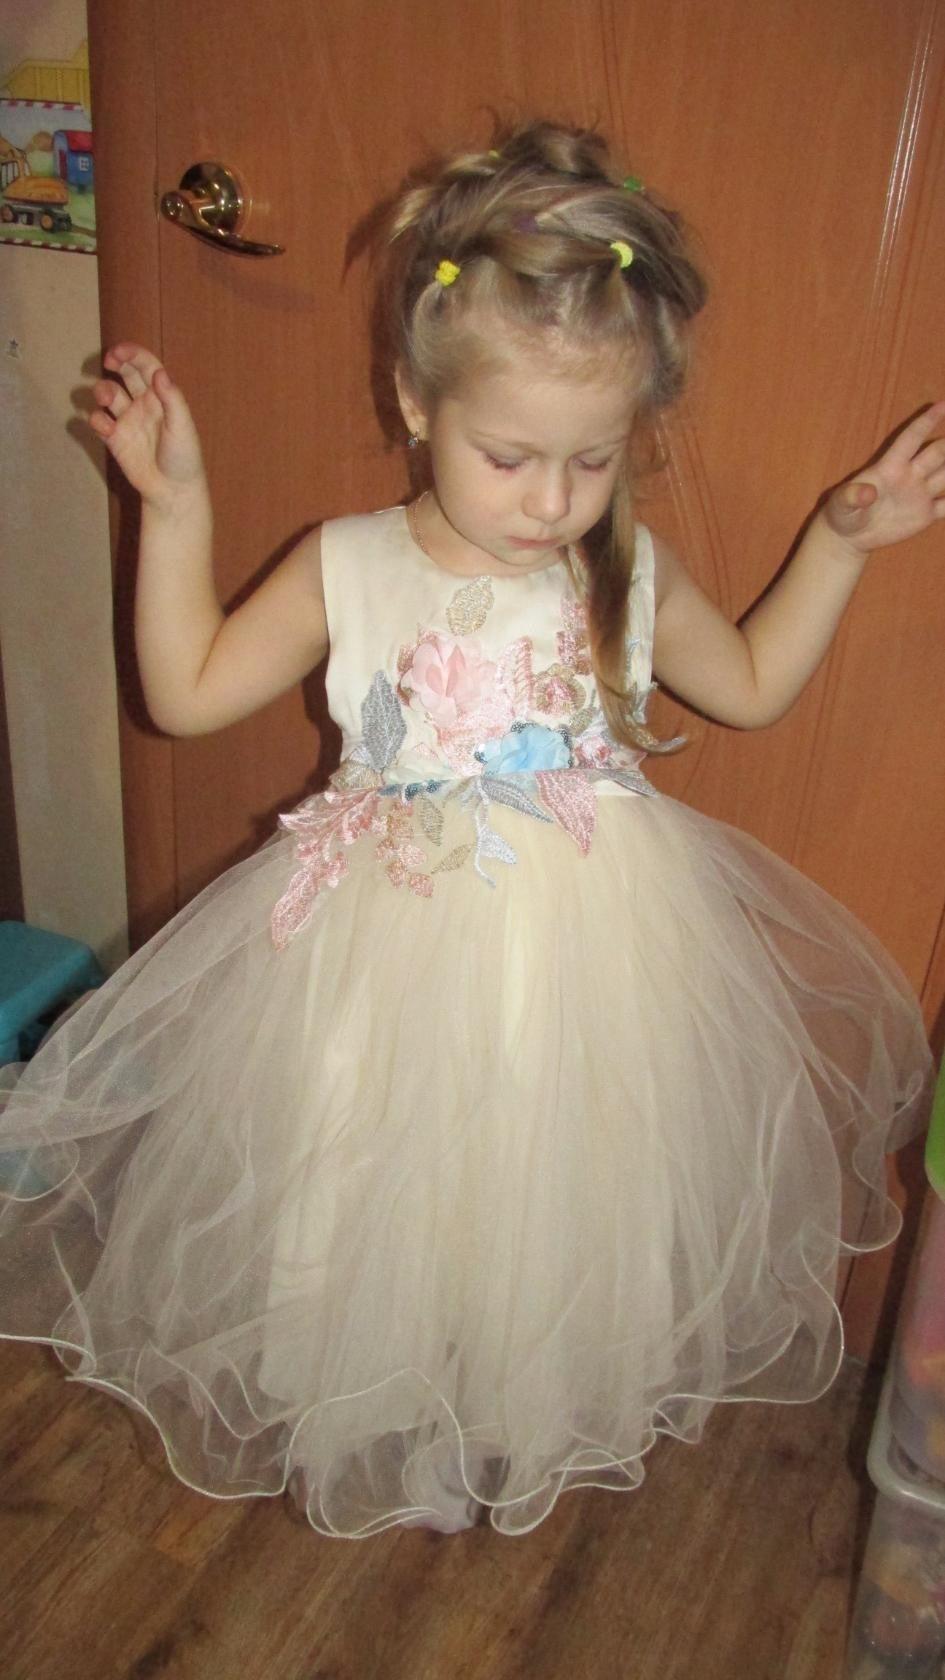 Праздник осени! ))). Принцесса собирается на бал